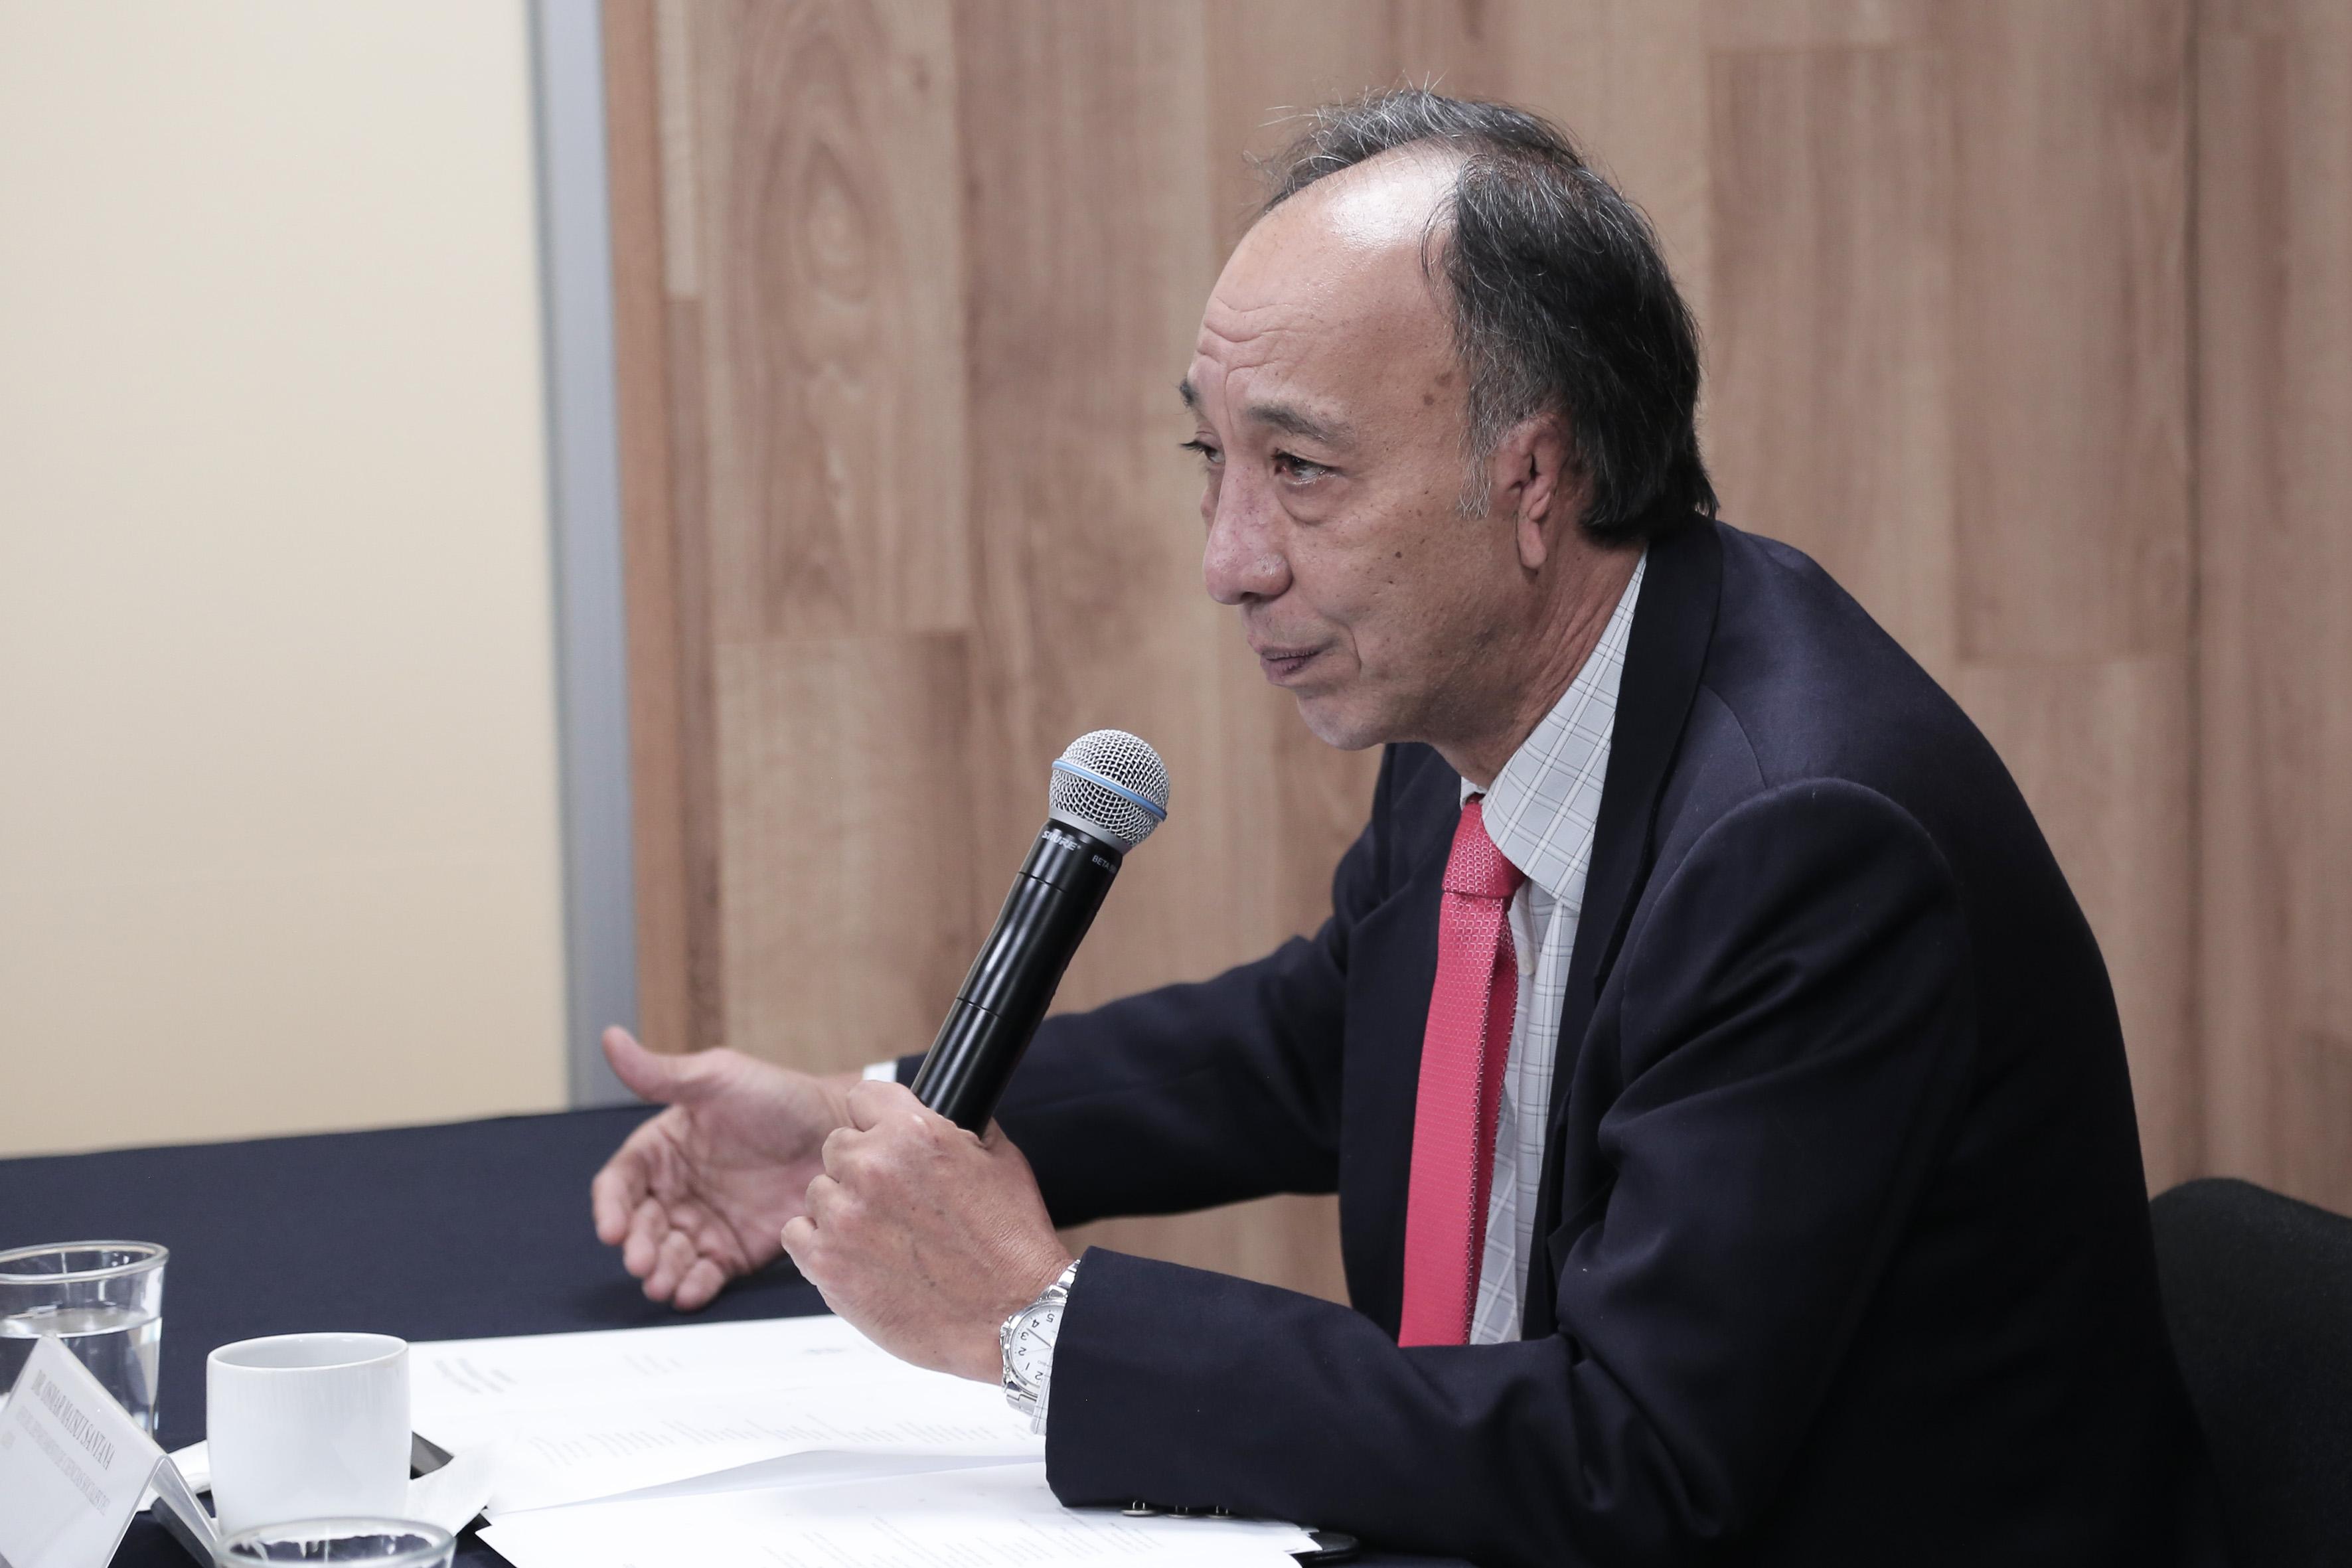 Dr. Osmar Matsui al micrófono